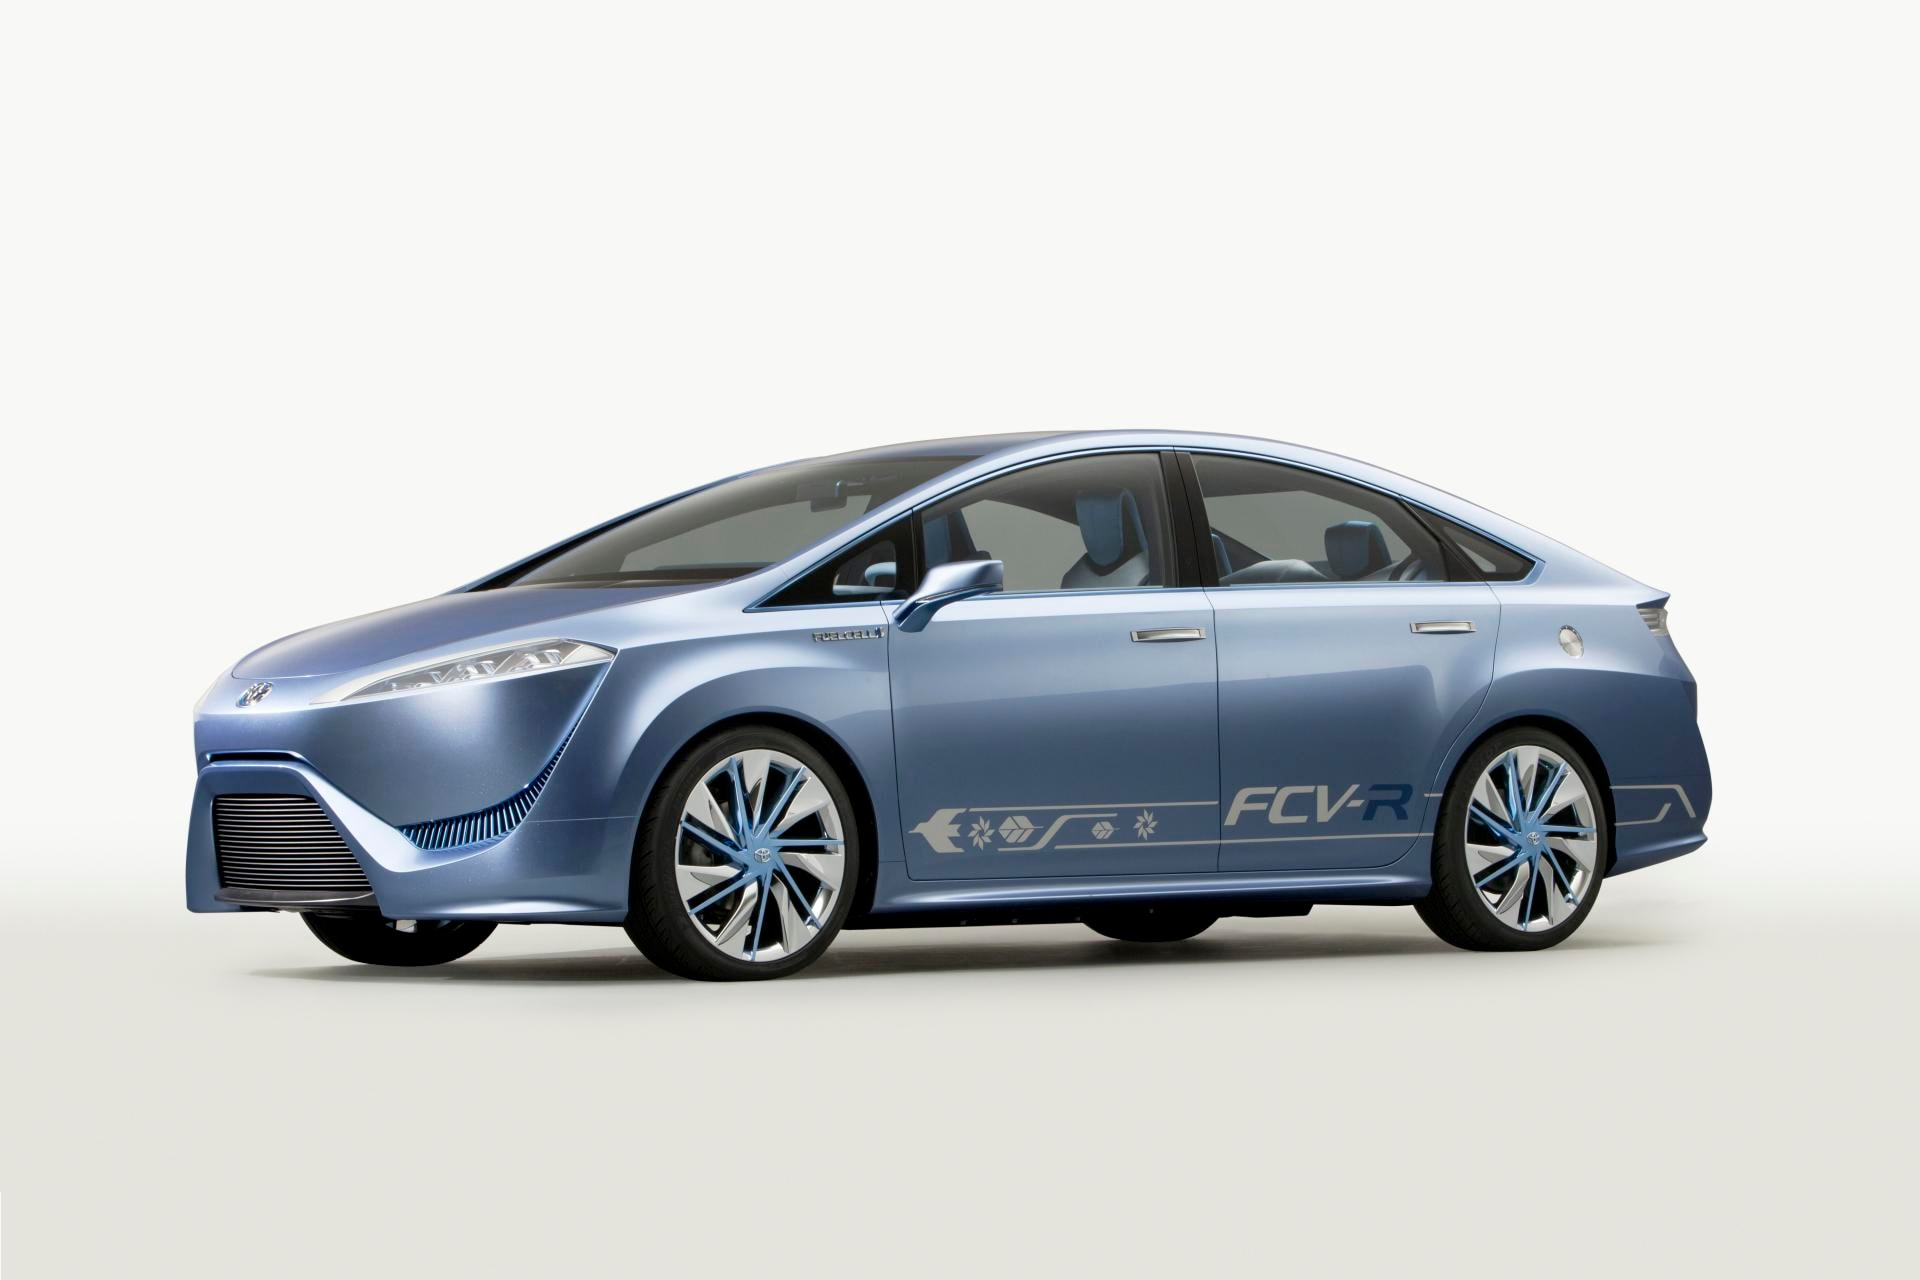 Toyota FCHV & FCV-R Concepts